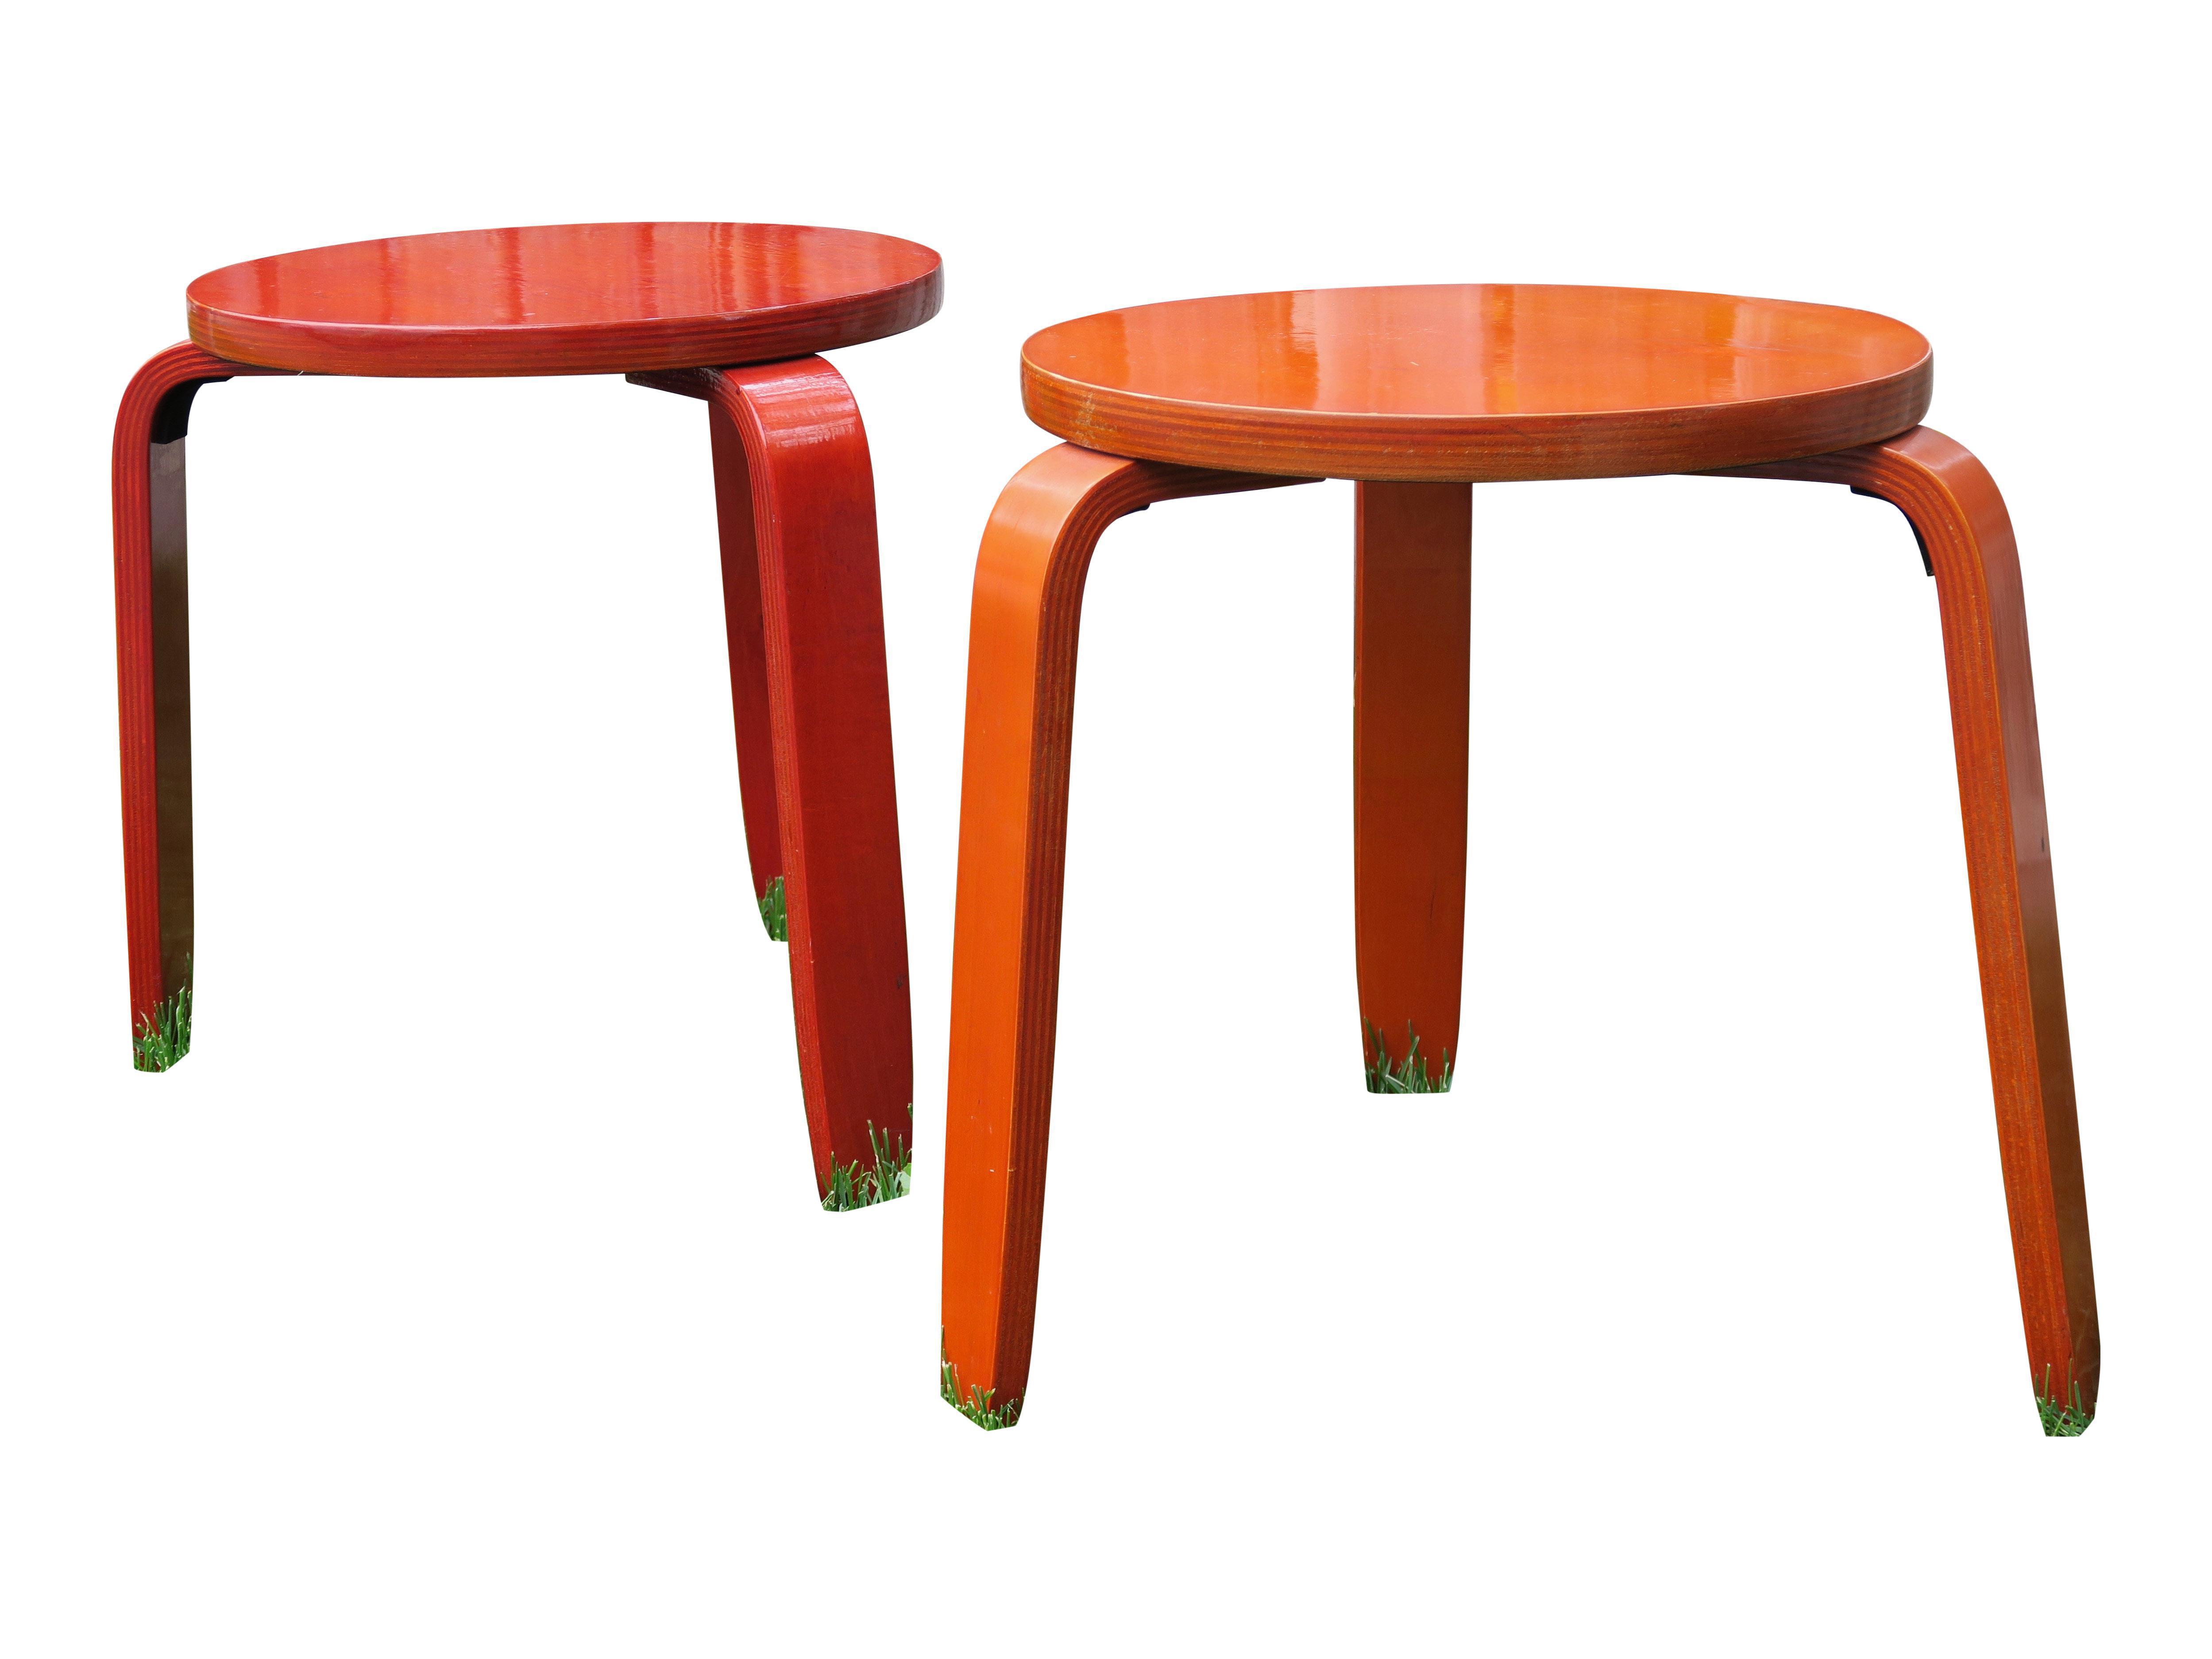 Mid-Century Red Stacking Stools - A Pair  sc 1 st  Chairish & Vintage u0026 Used Mid-Century Modern Low Stools | Chairish islam-shia.org